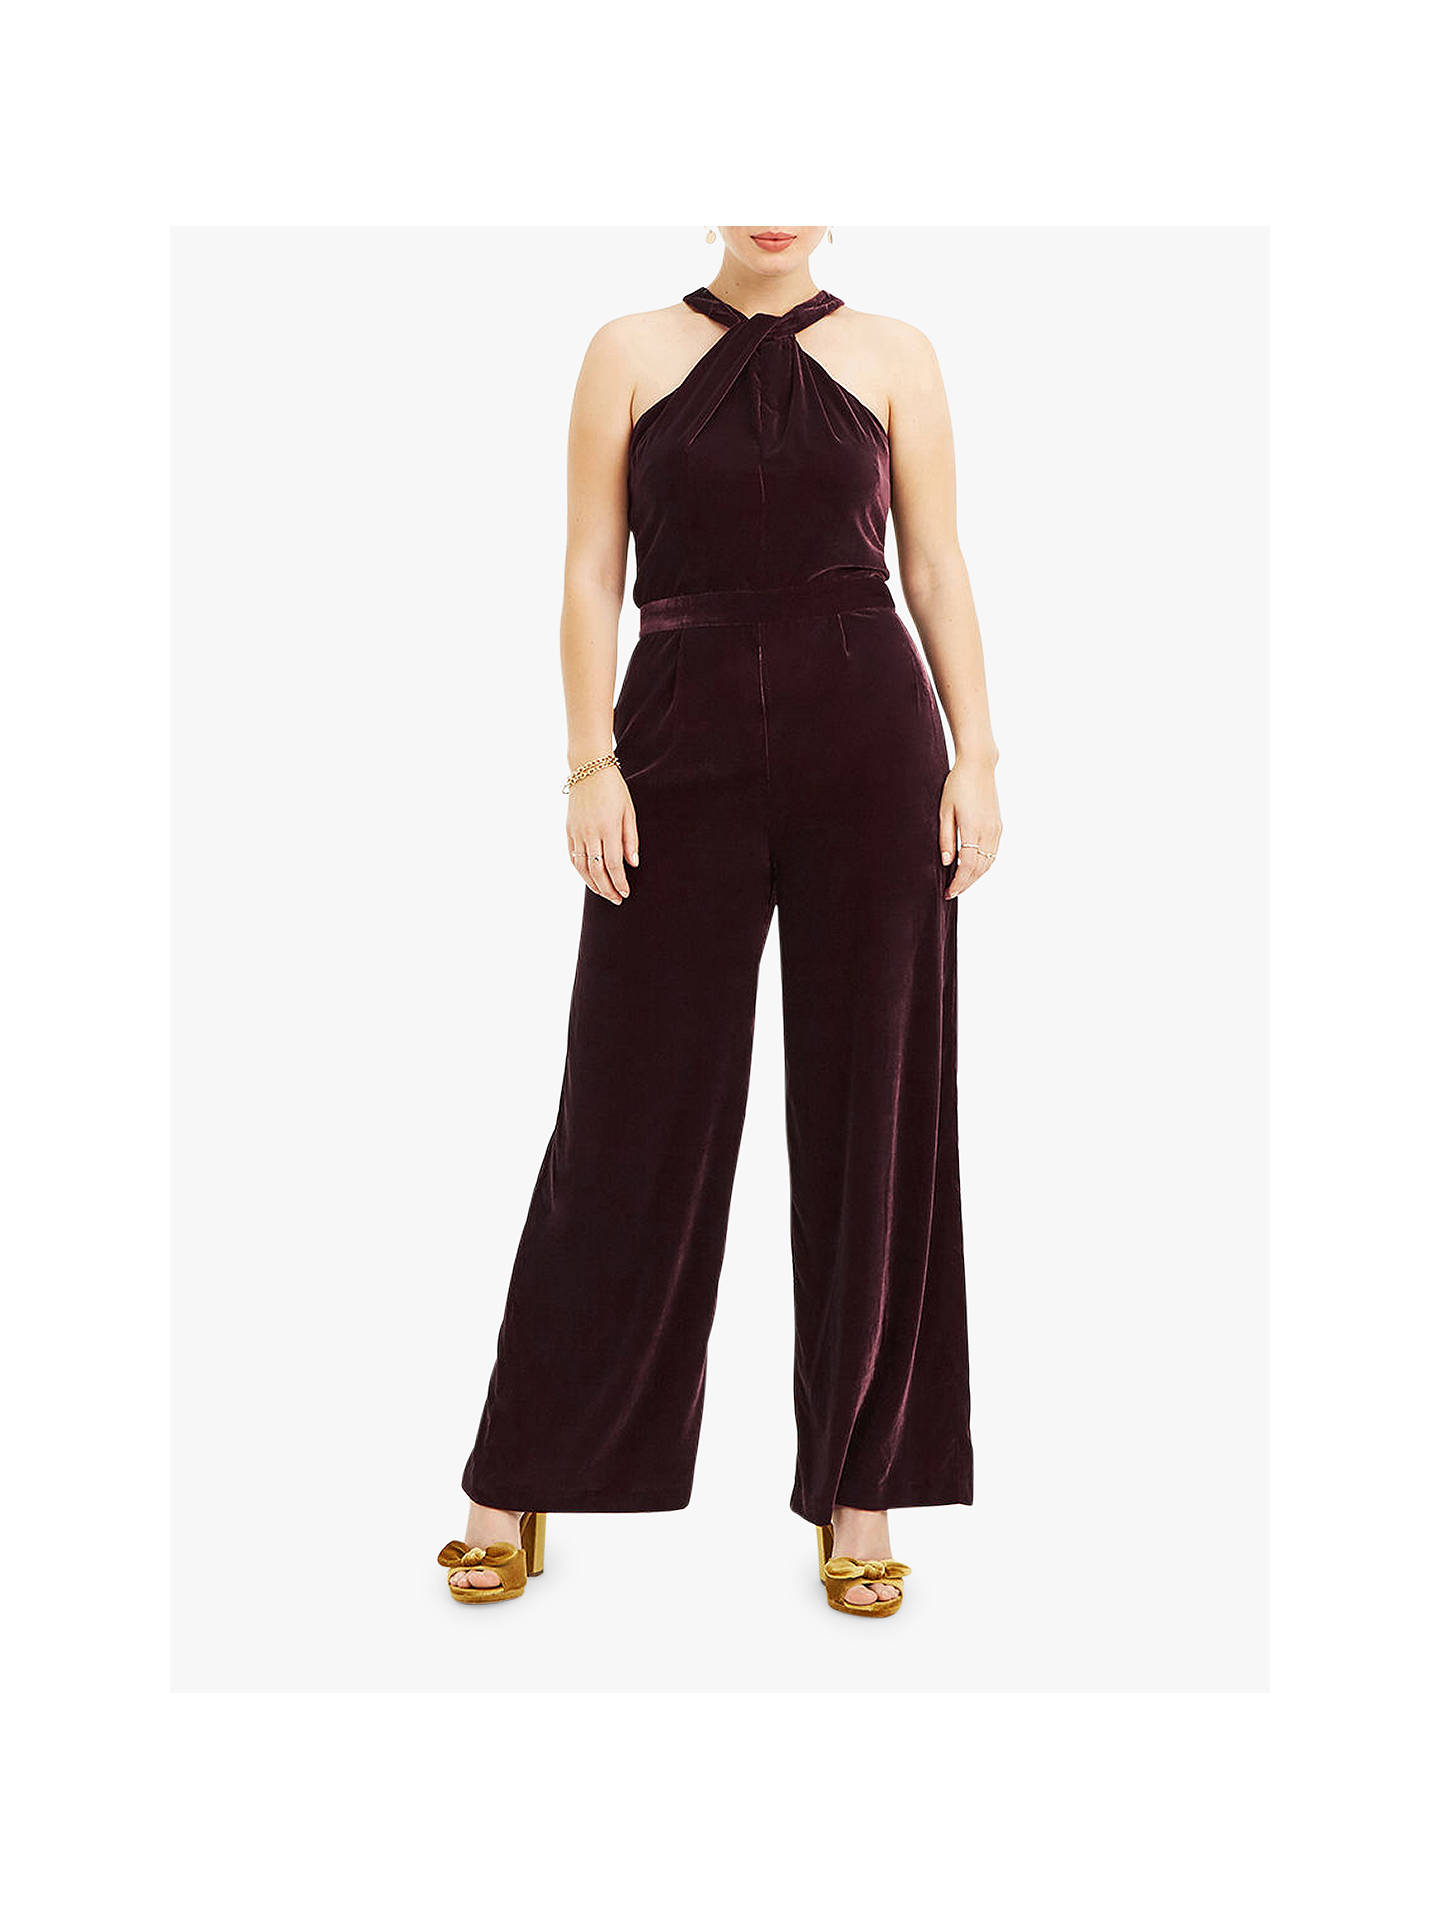 08c6e5775fd Buy Oasis Velvet Twist Jumpsuit